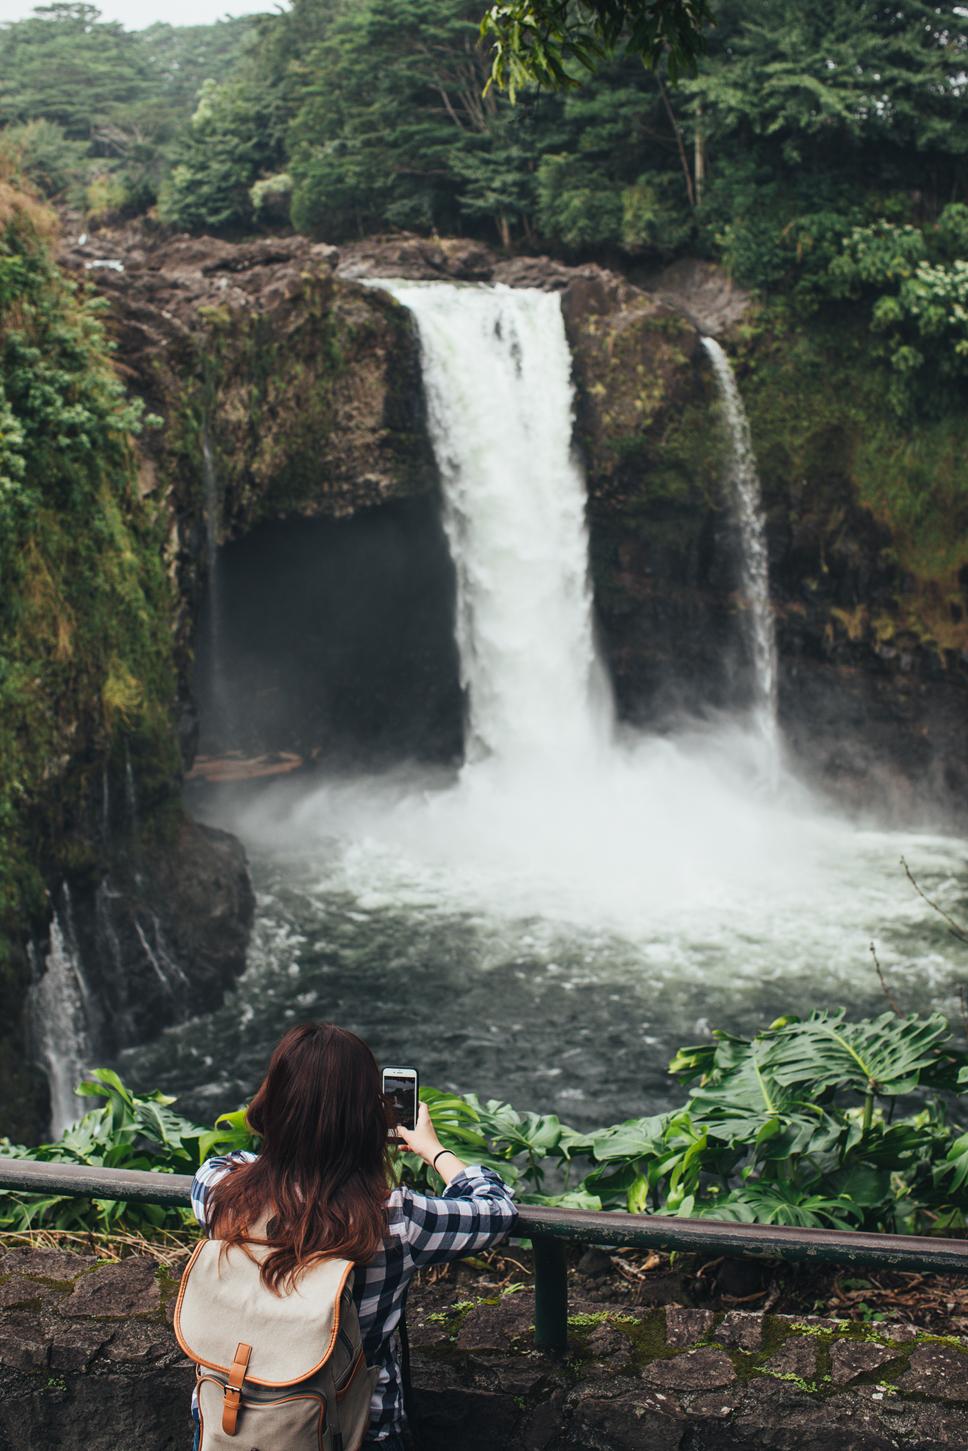 Waianuenue (Rainbow Falls)-  Hawaii Tourism Authority (HTA) / Mark Kushimi